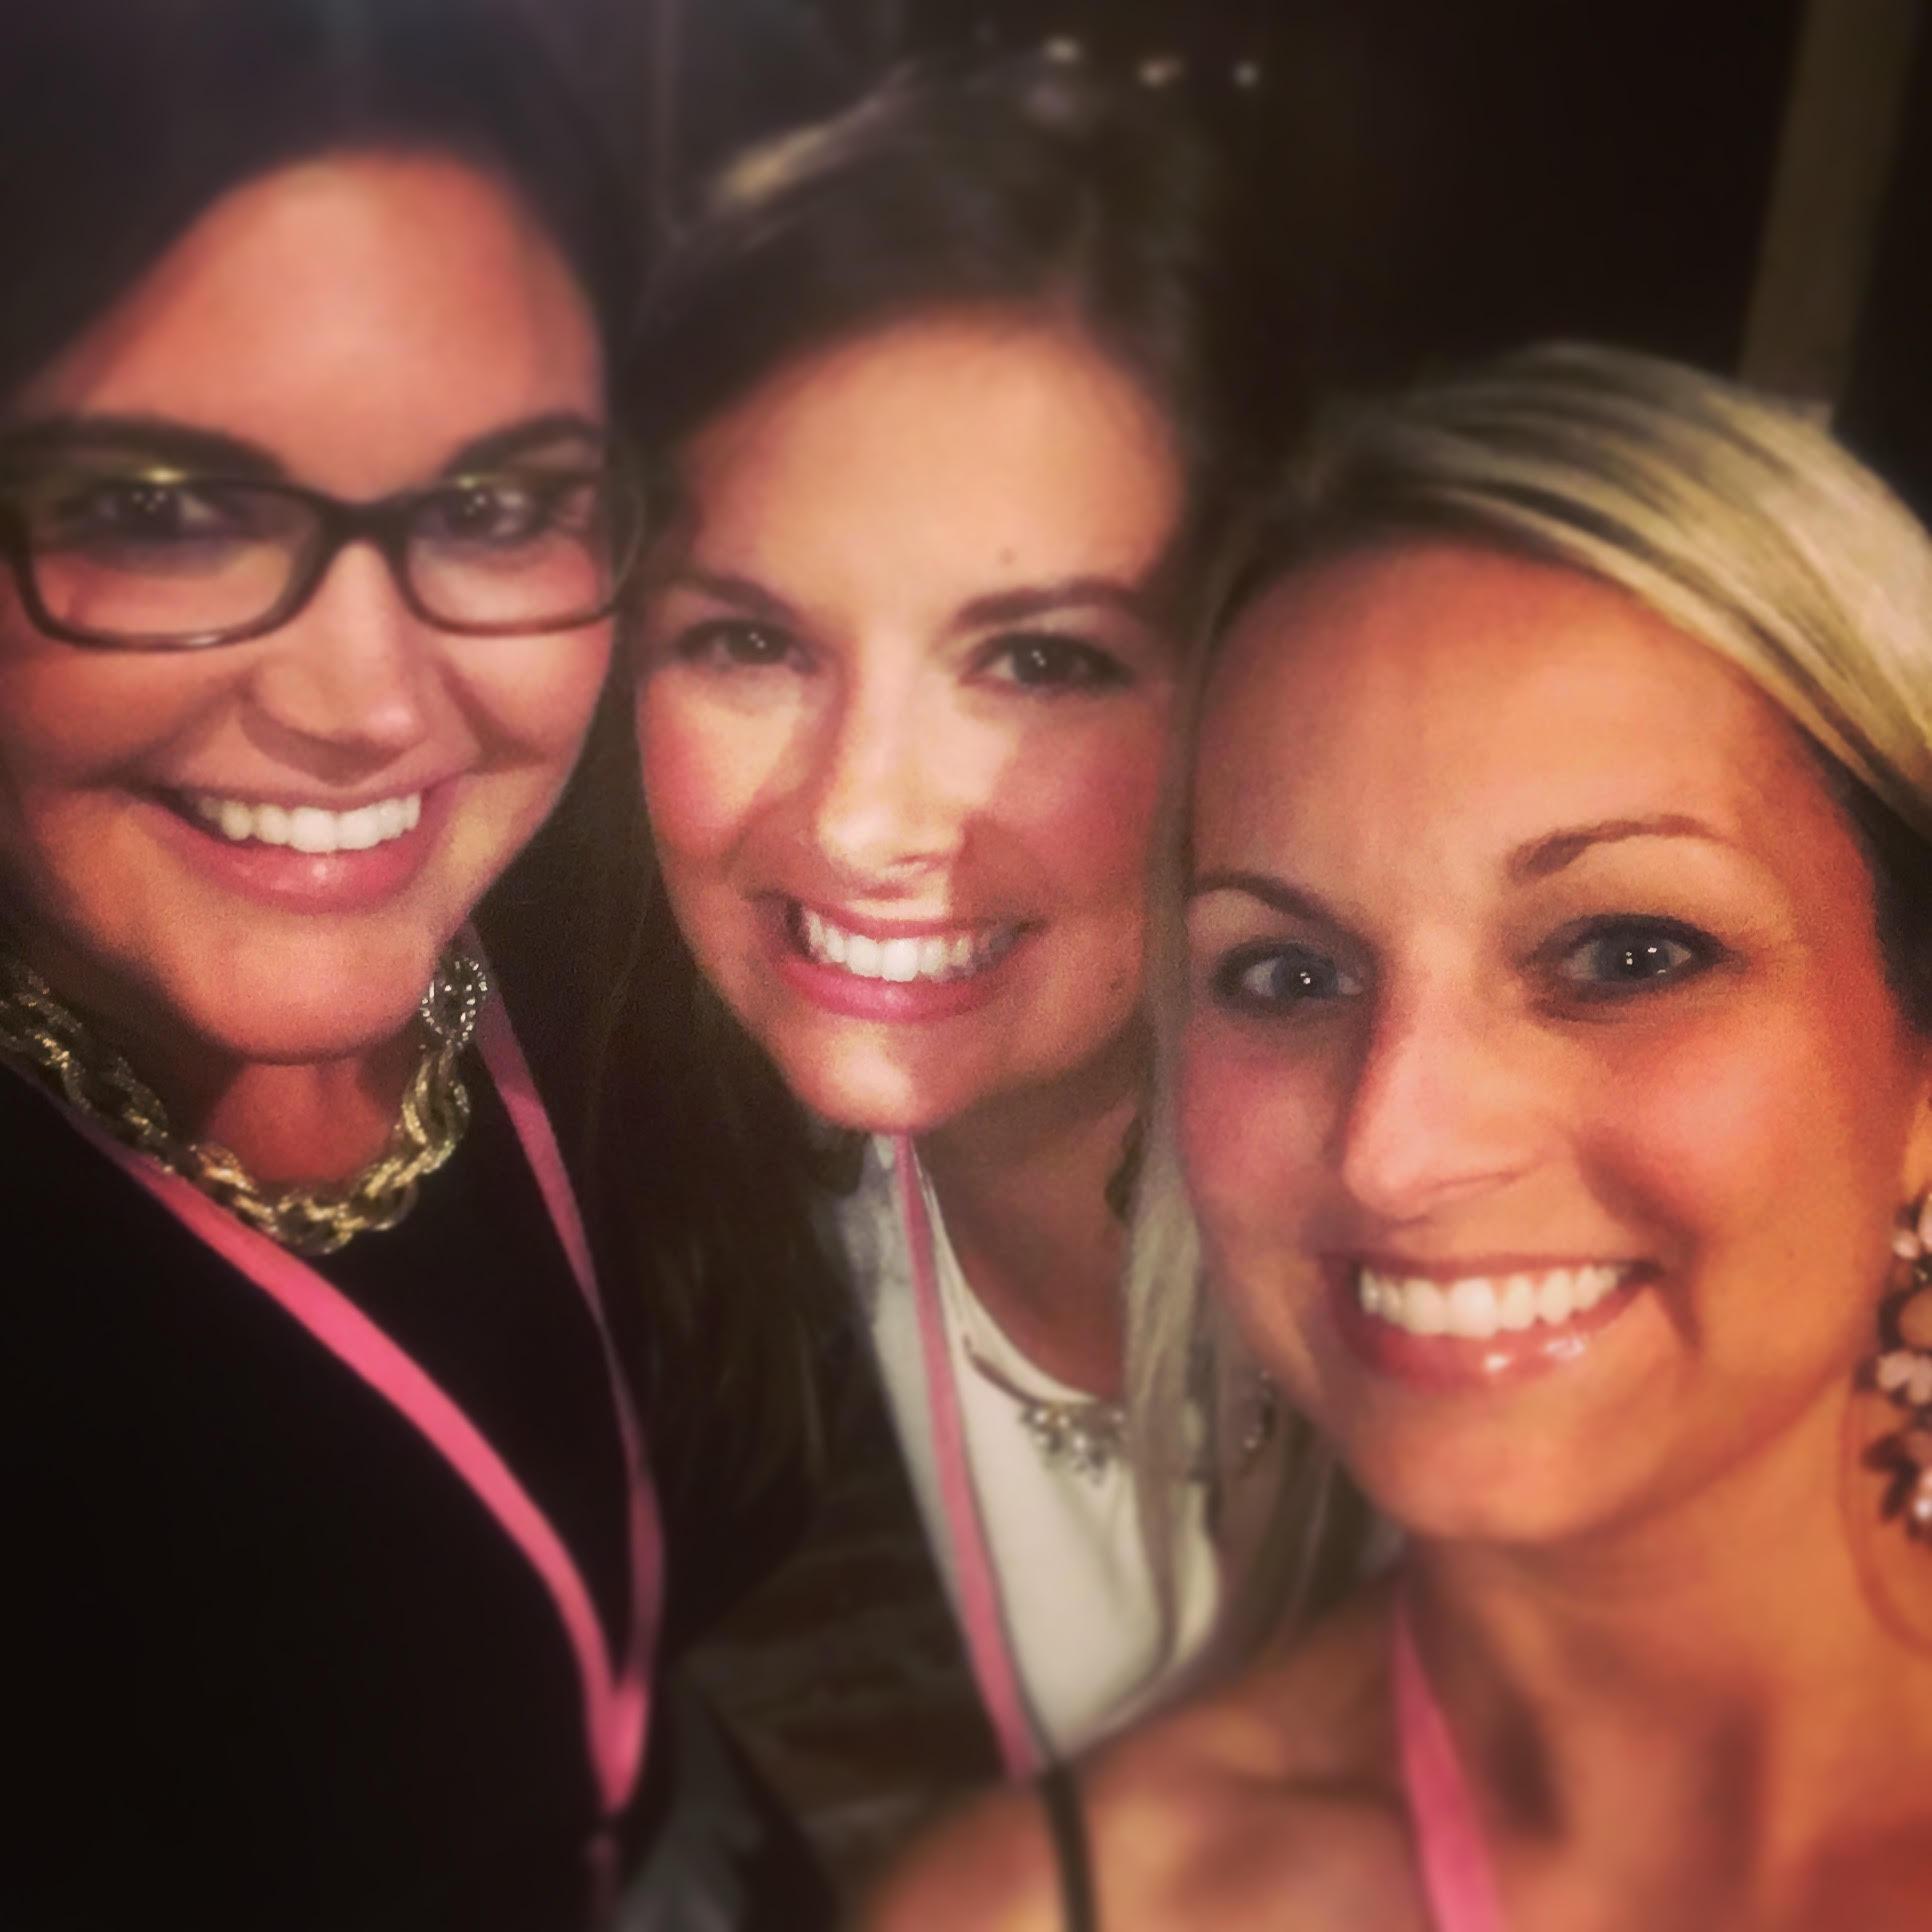 Katelyn, Laura & I